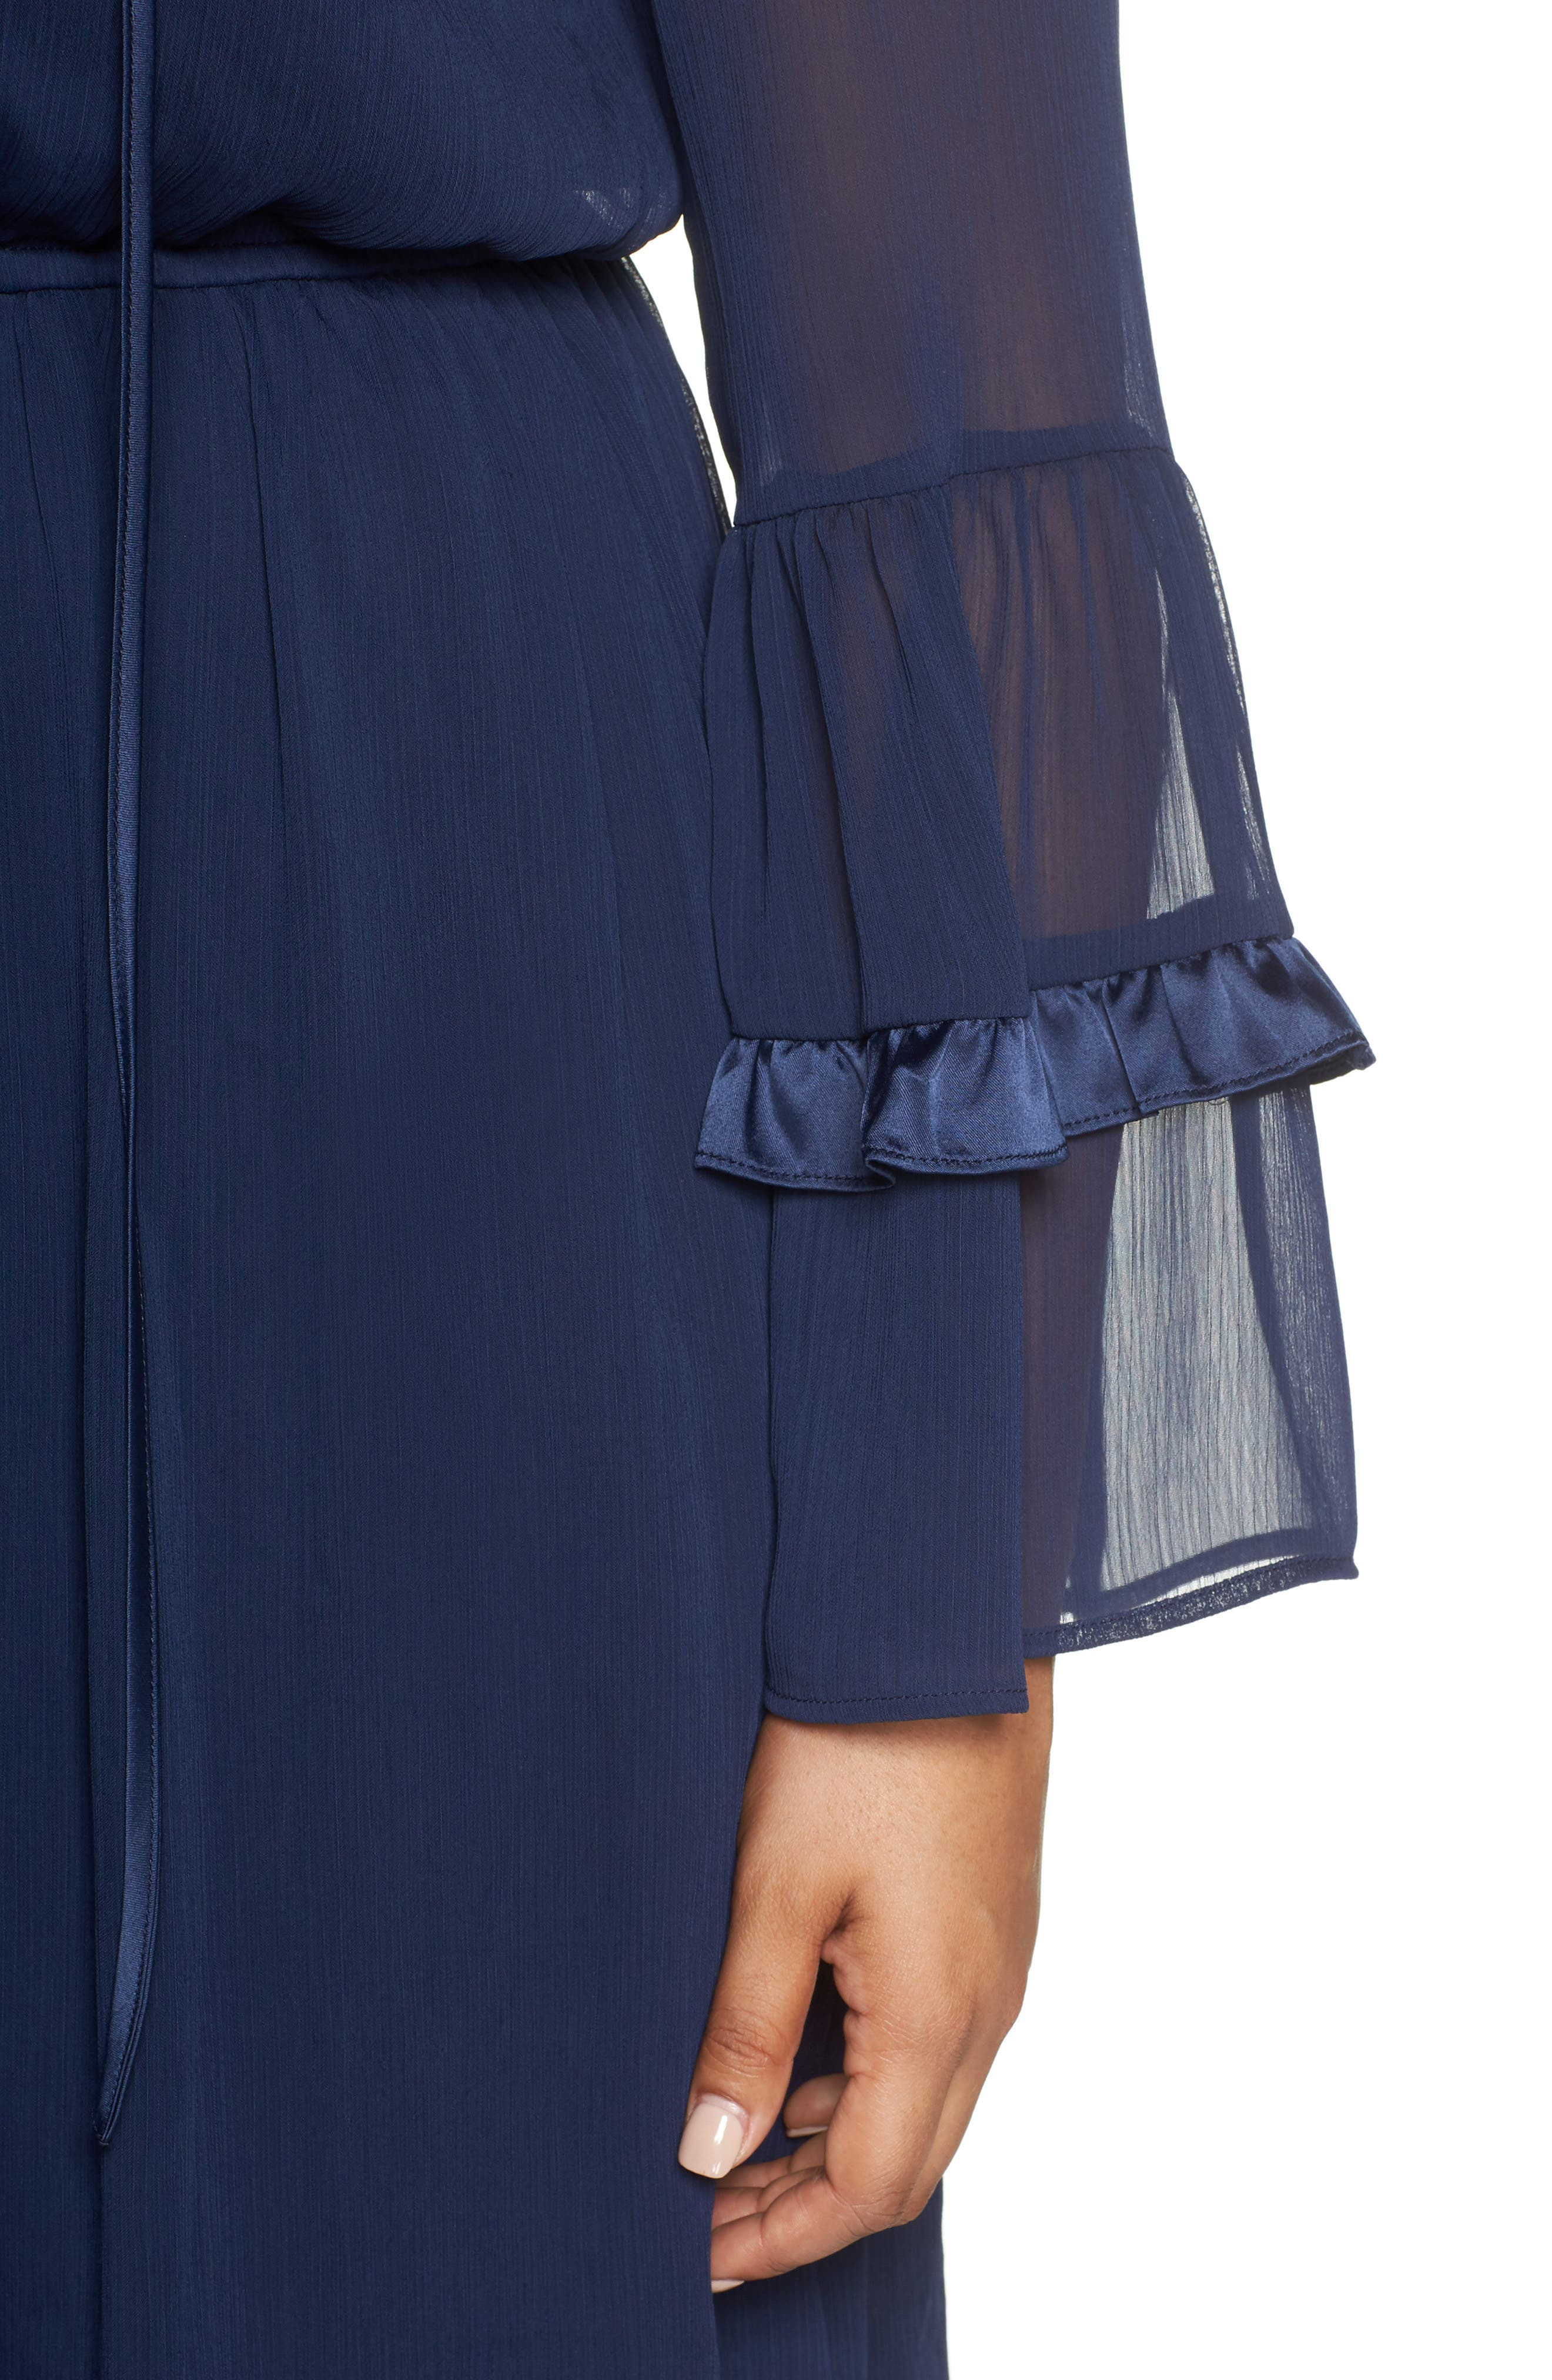 Satin Trim Chiffon Dress,                             Alternate thumbnail 4, color,                             NAVY